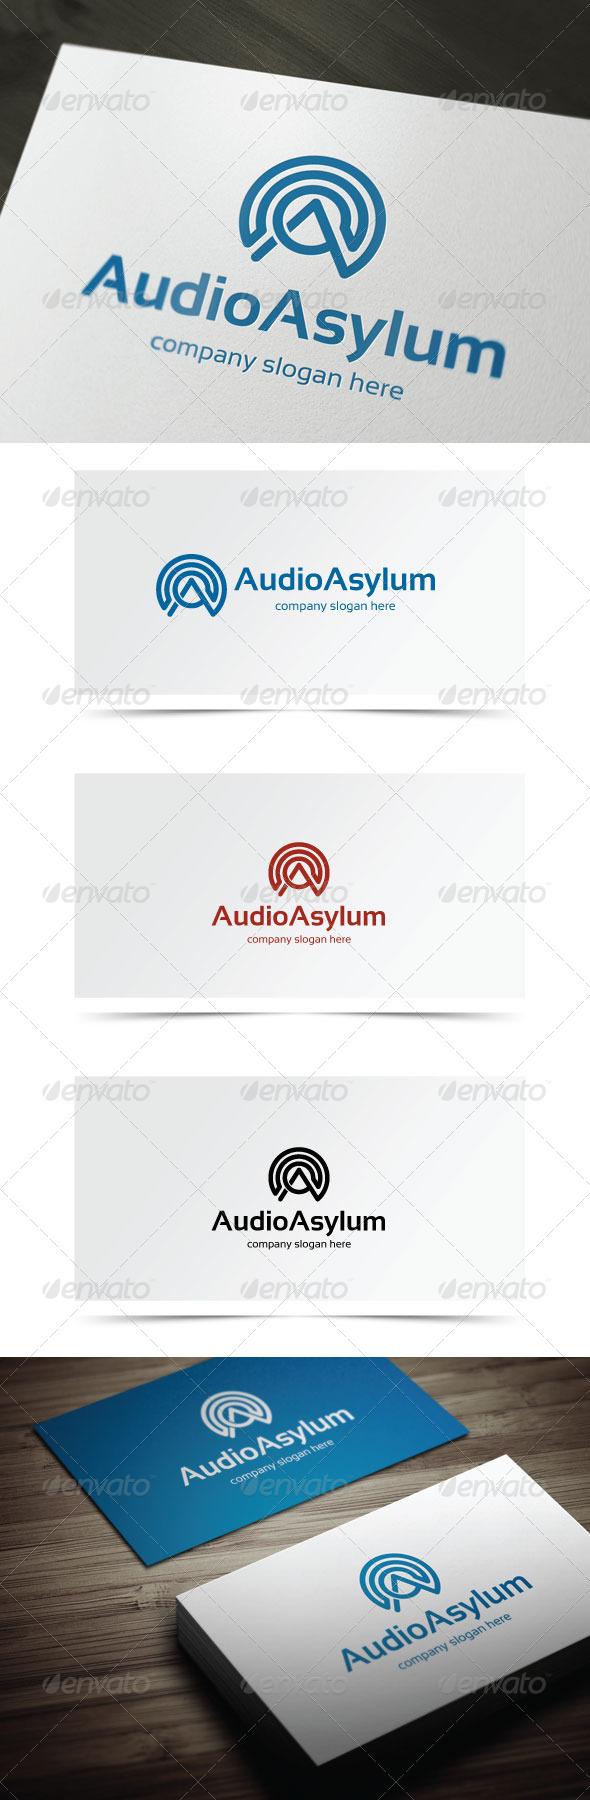 GraphicRiver Audio Asylum 6612042